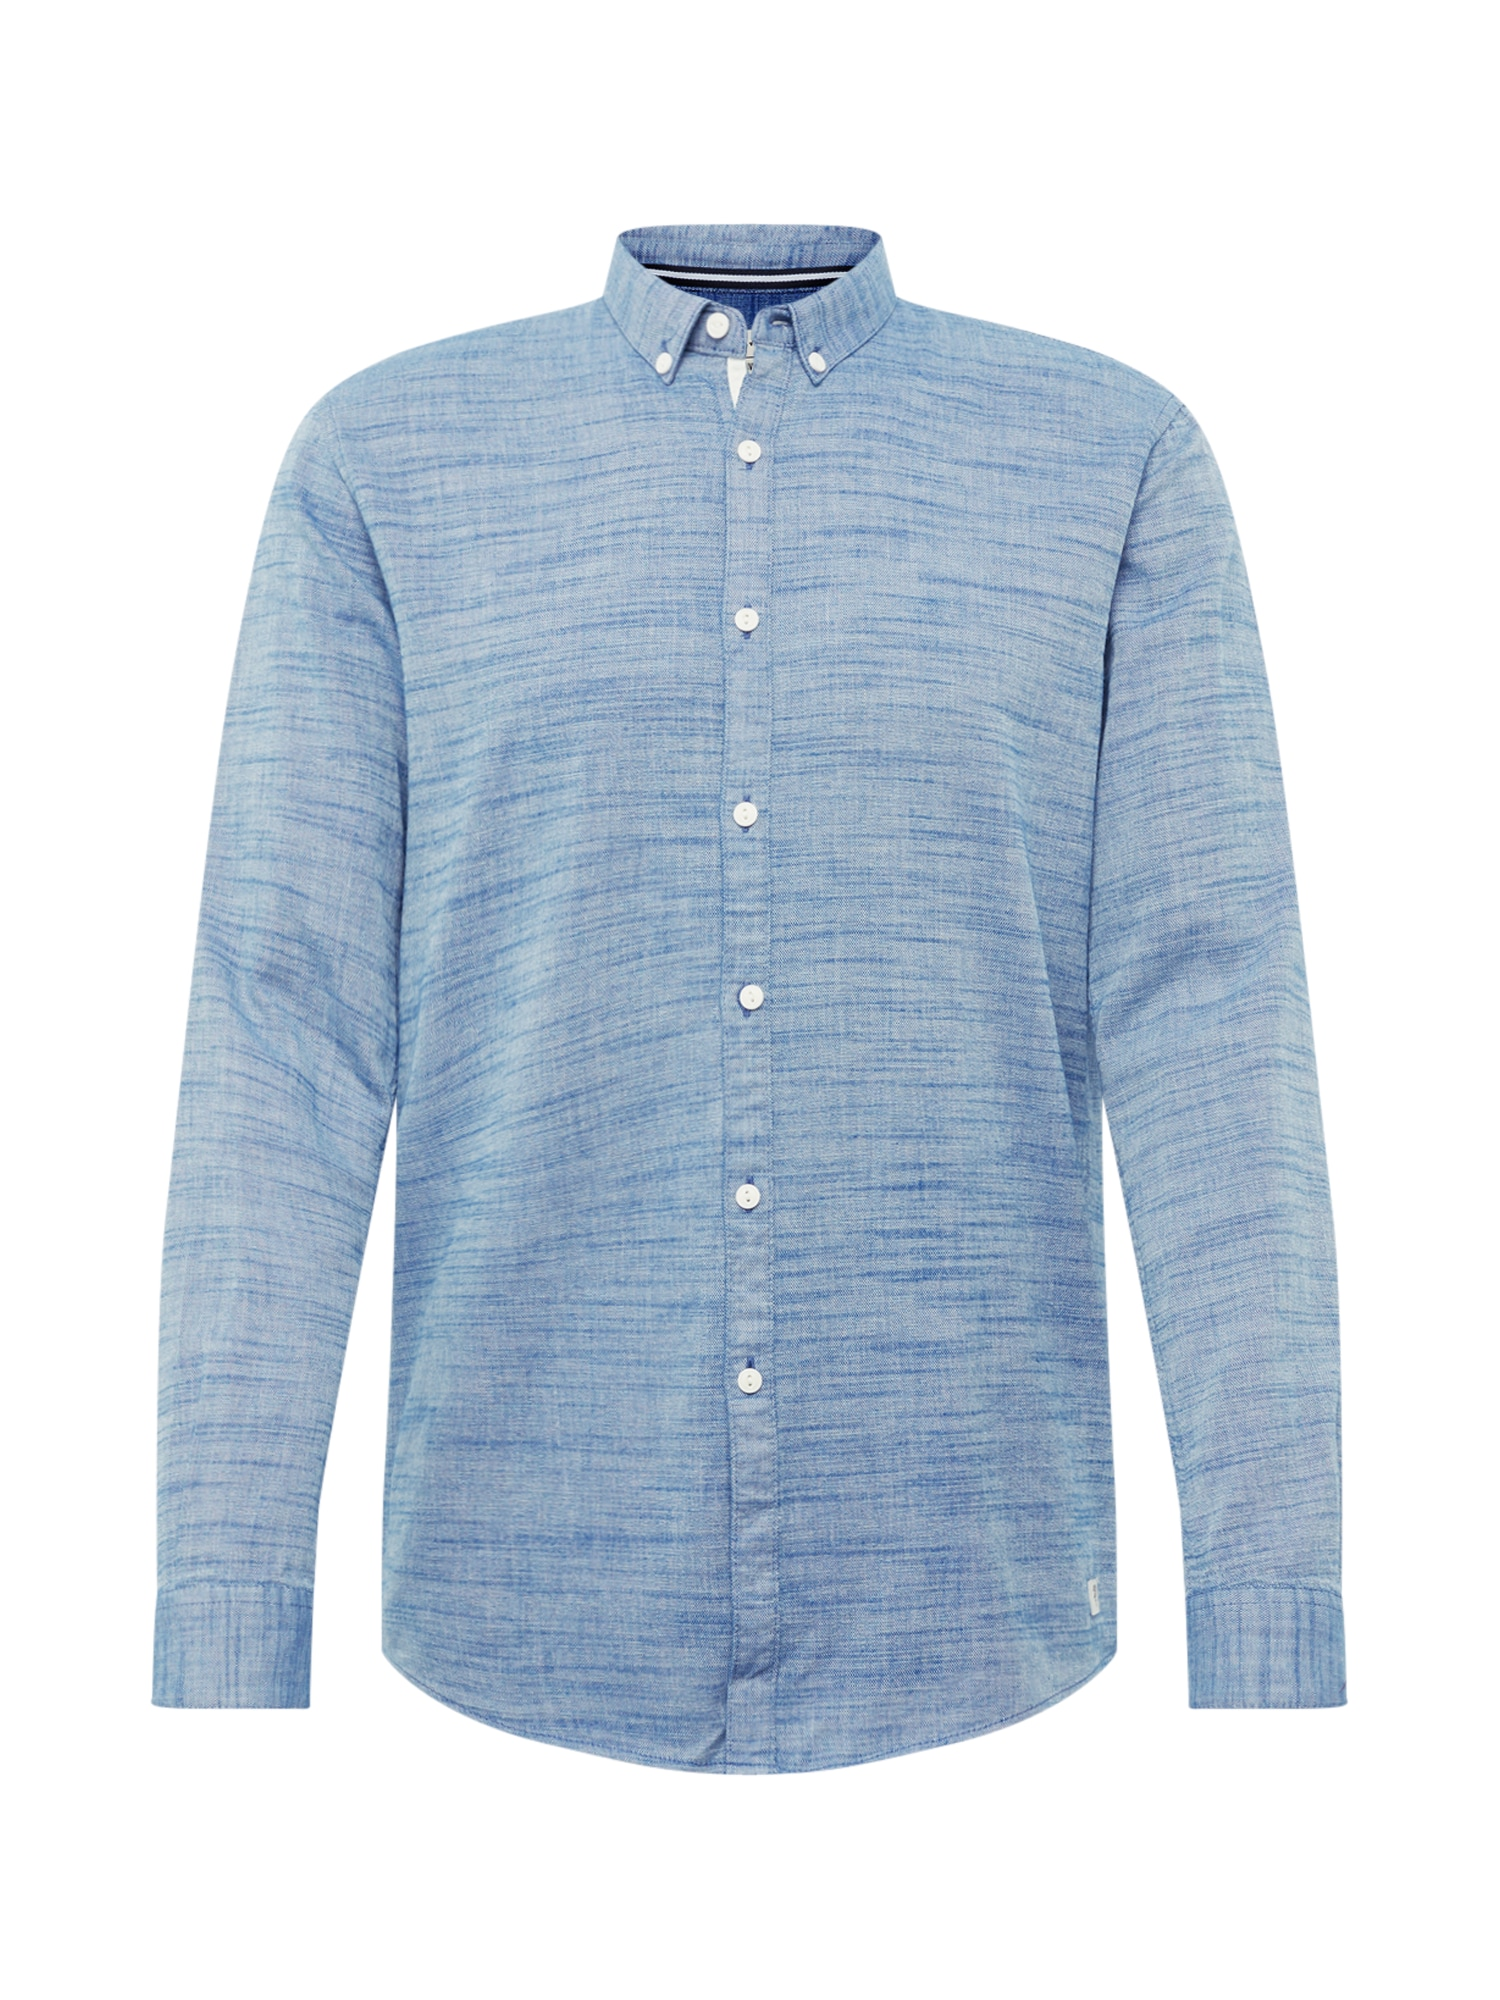 Košile blau TOM TAILOR DENIM